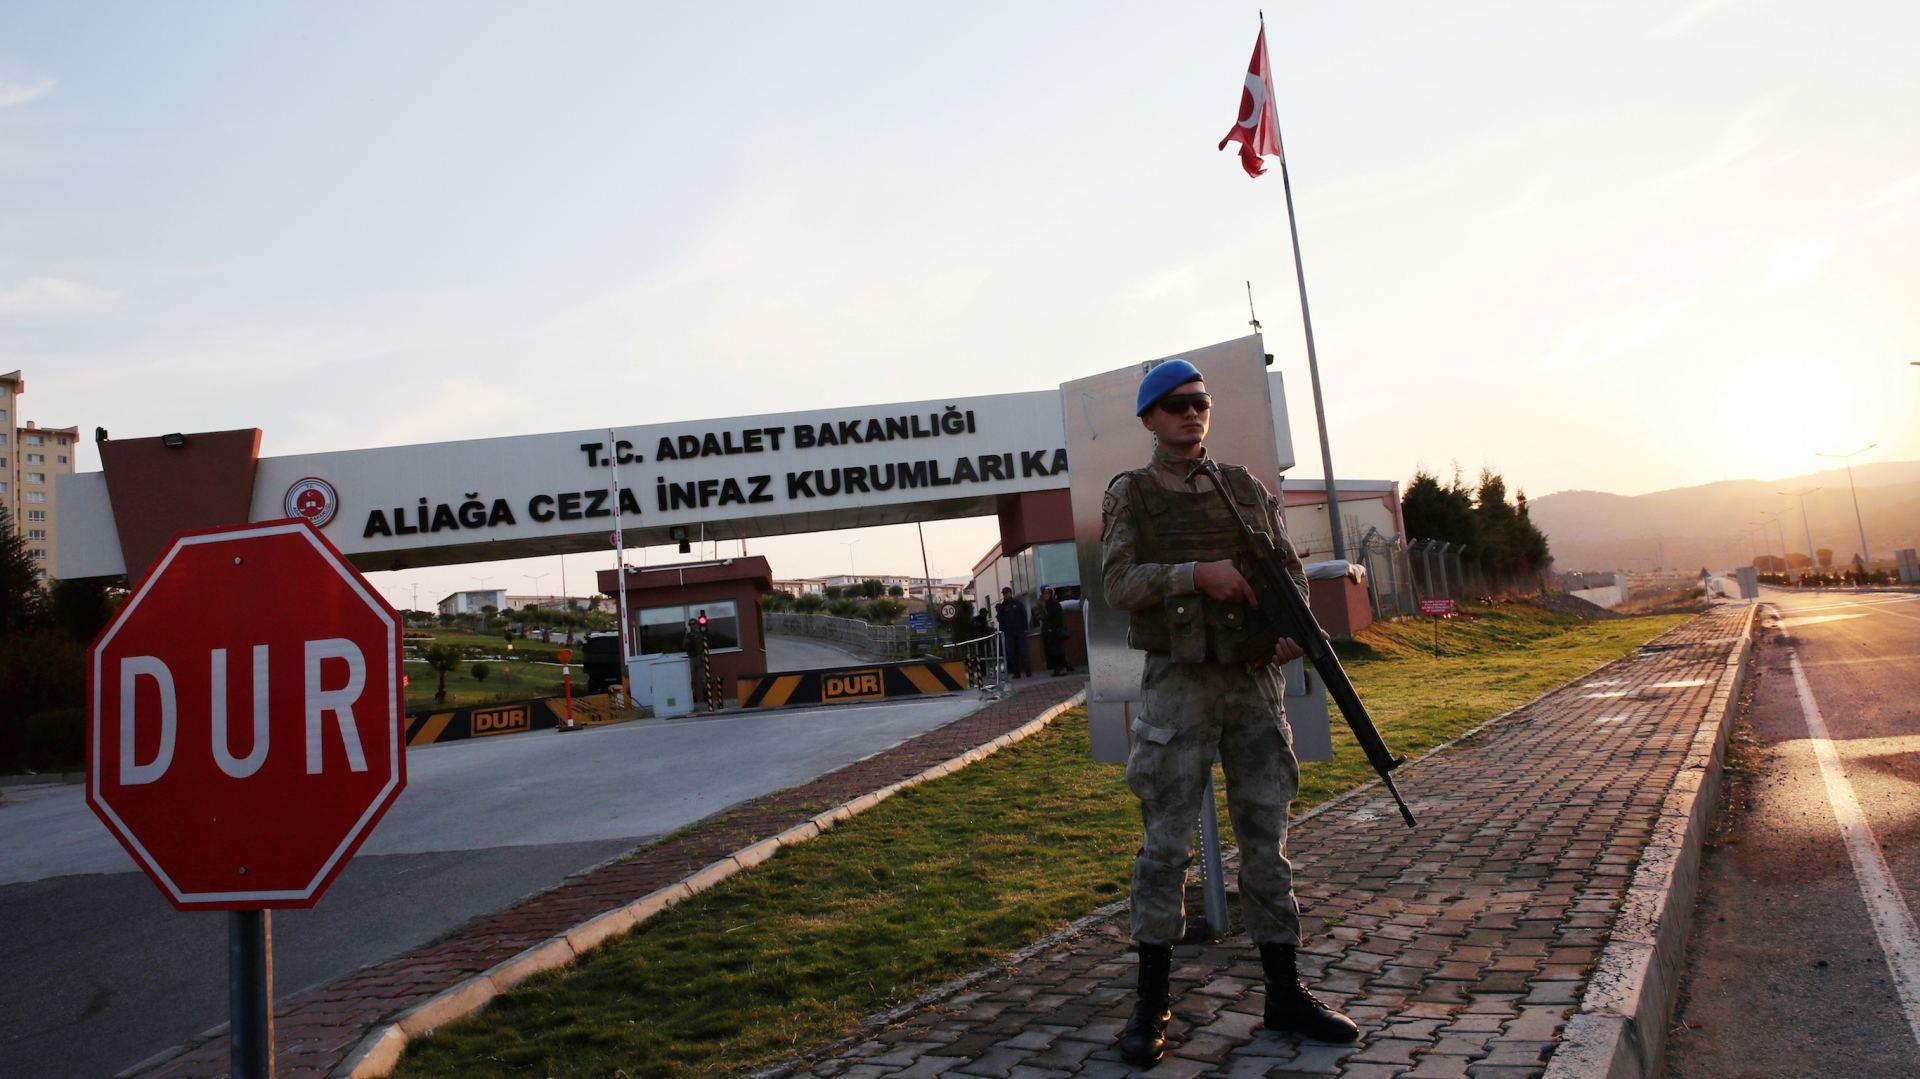 Turkey set to release some 45,000 inmates in coronavirus response